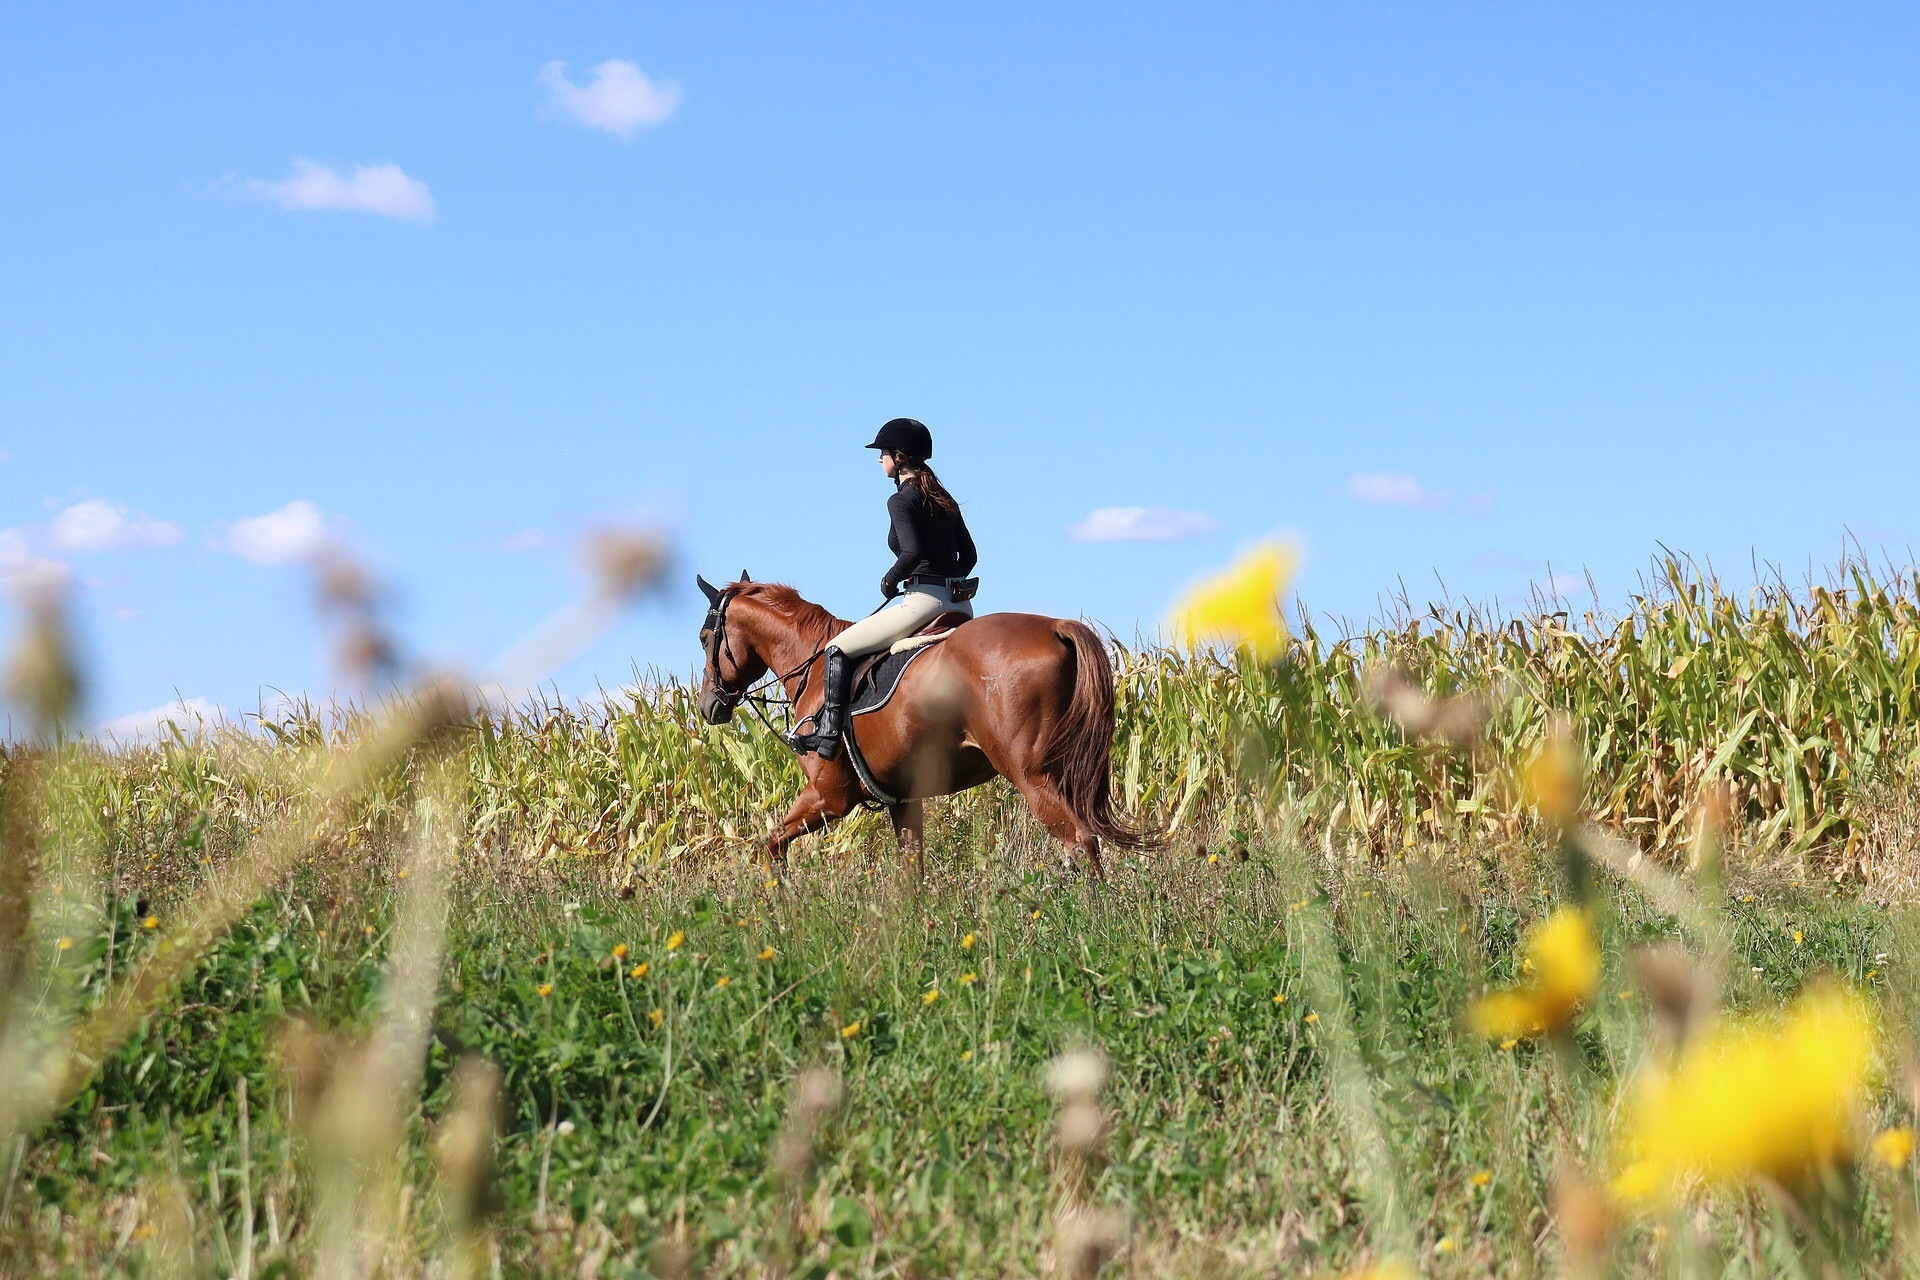 Horseback Riding by Chris HorizonRide